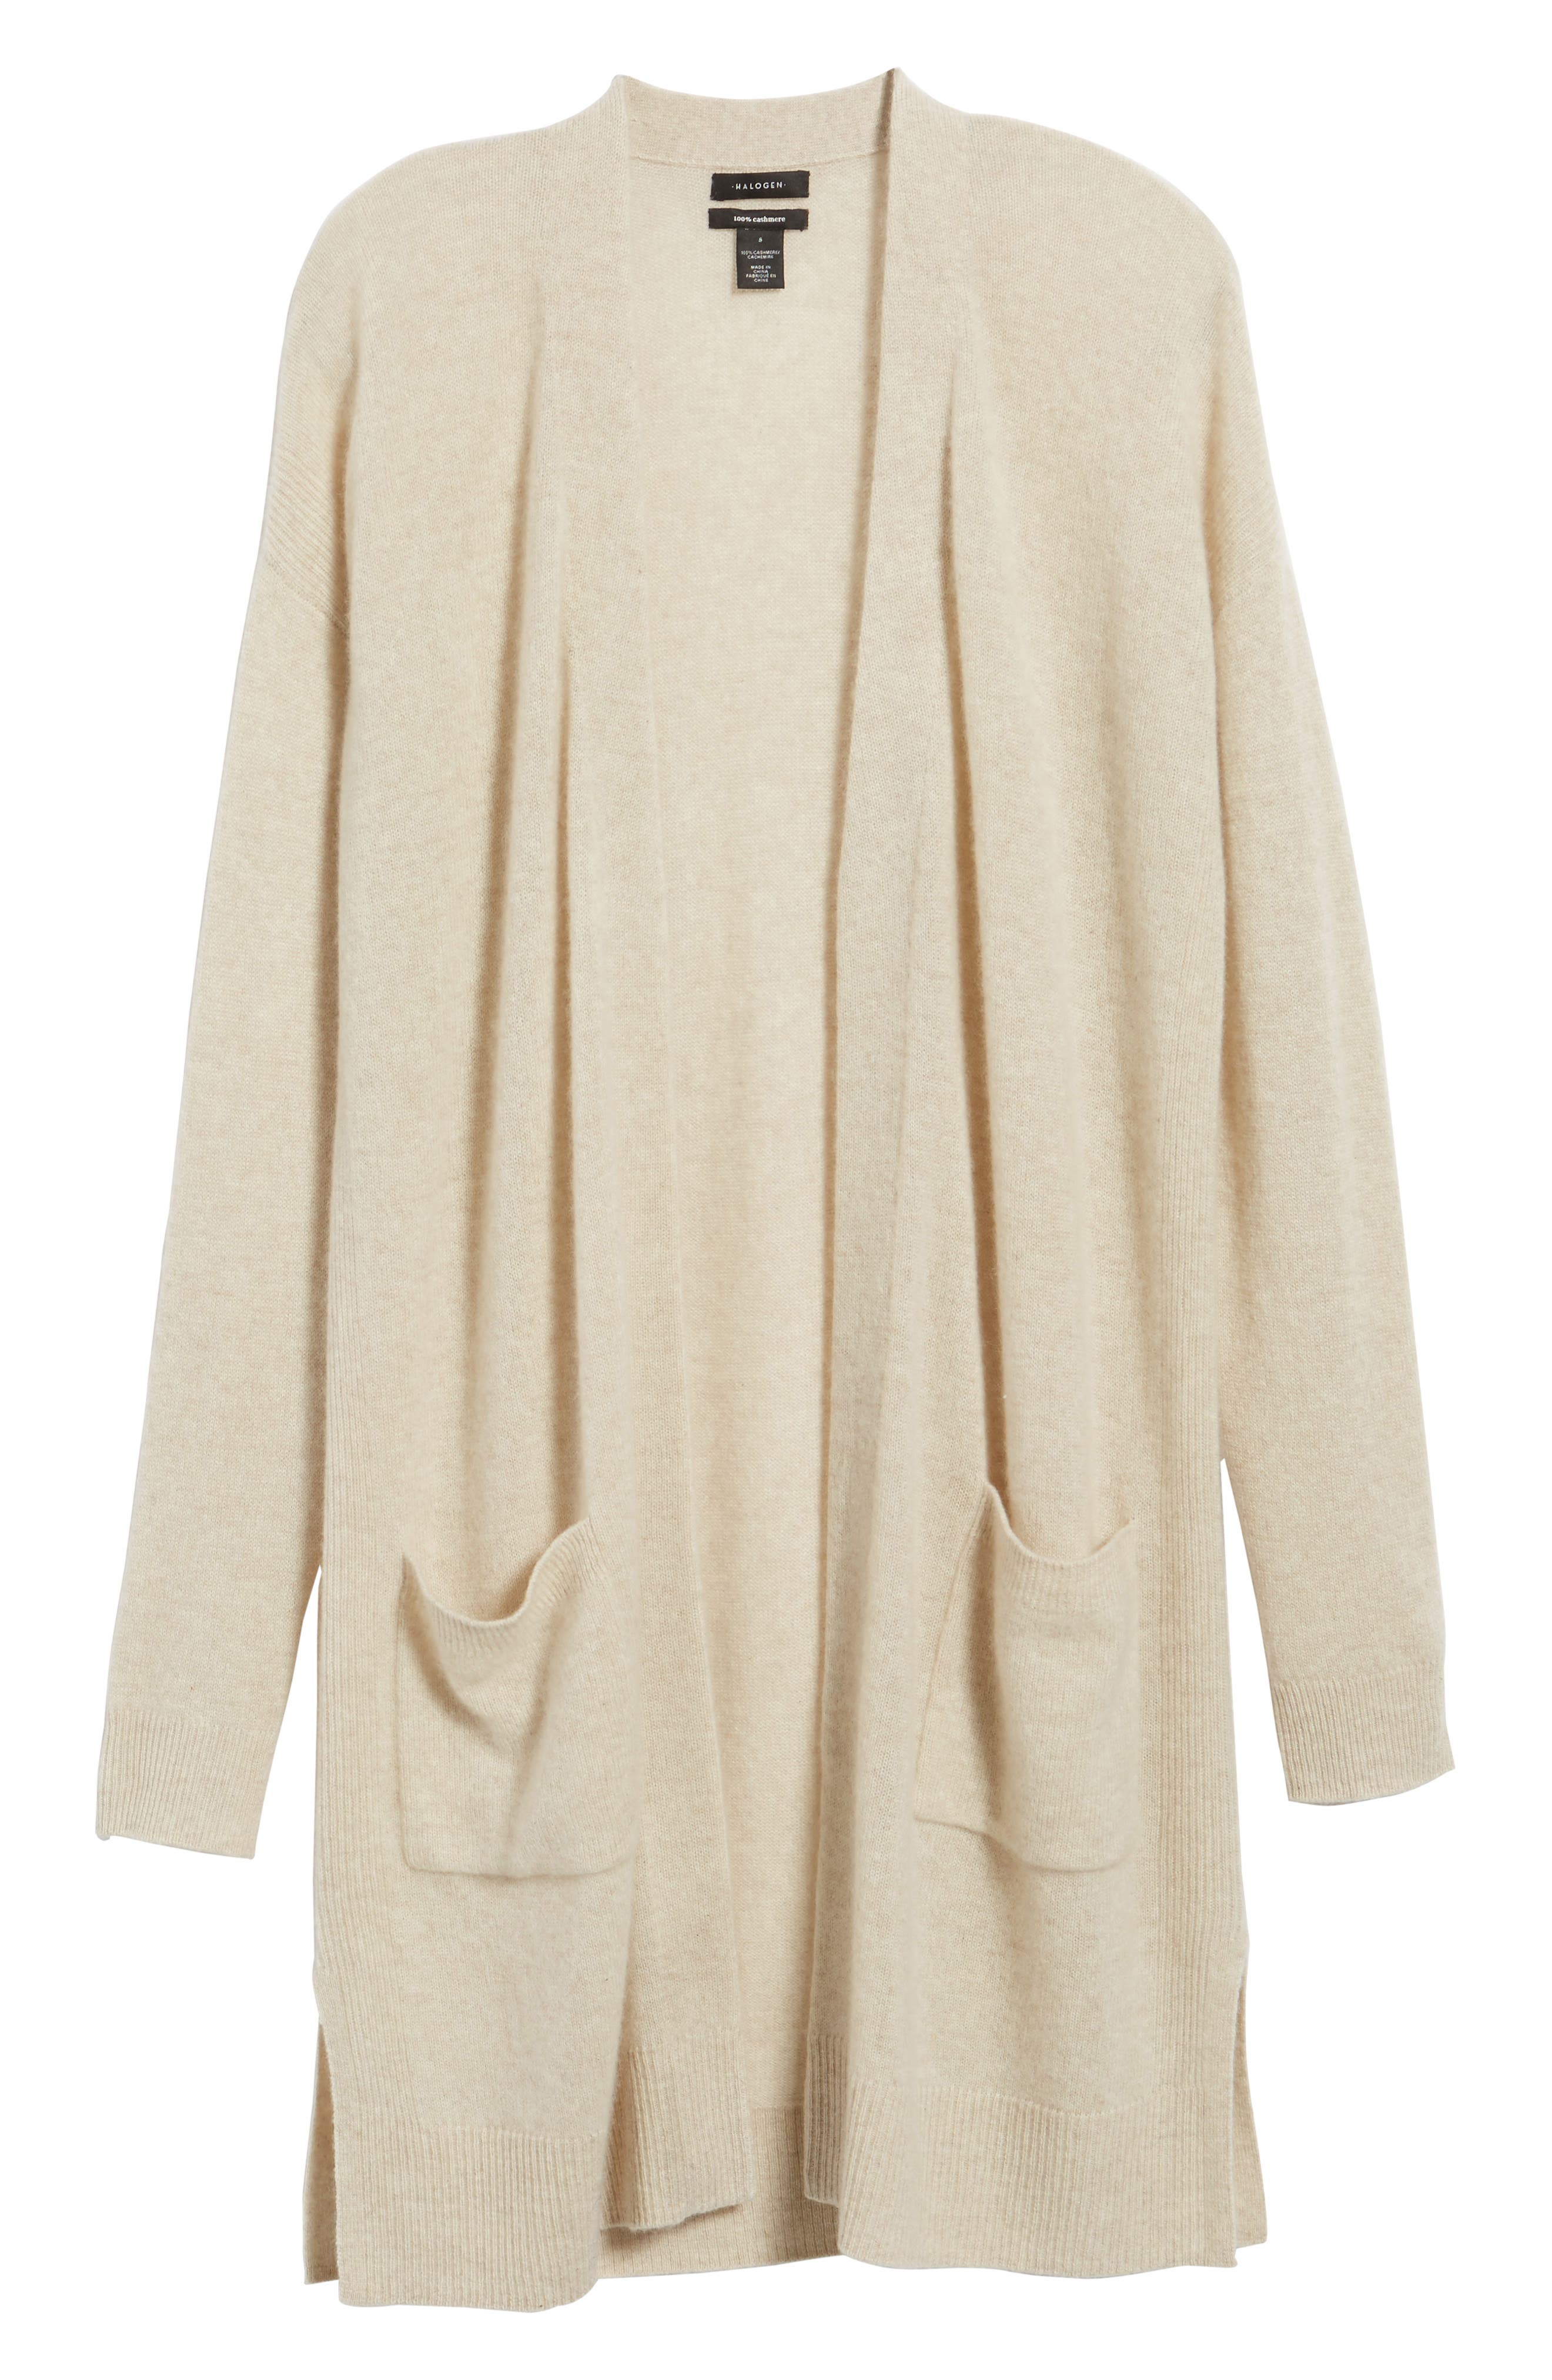 Alternate Image 1 Selected - Halogen® Rib Knit Wool & Cashmere Cardigan (Regular & Petite)